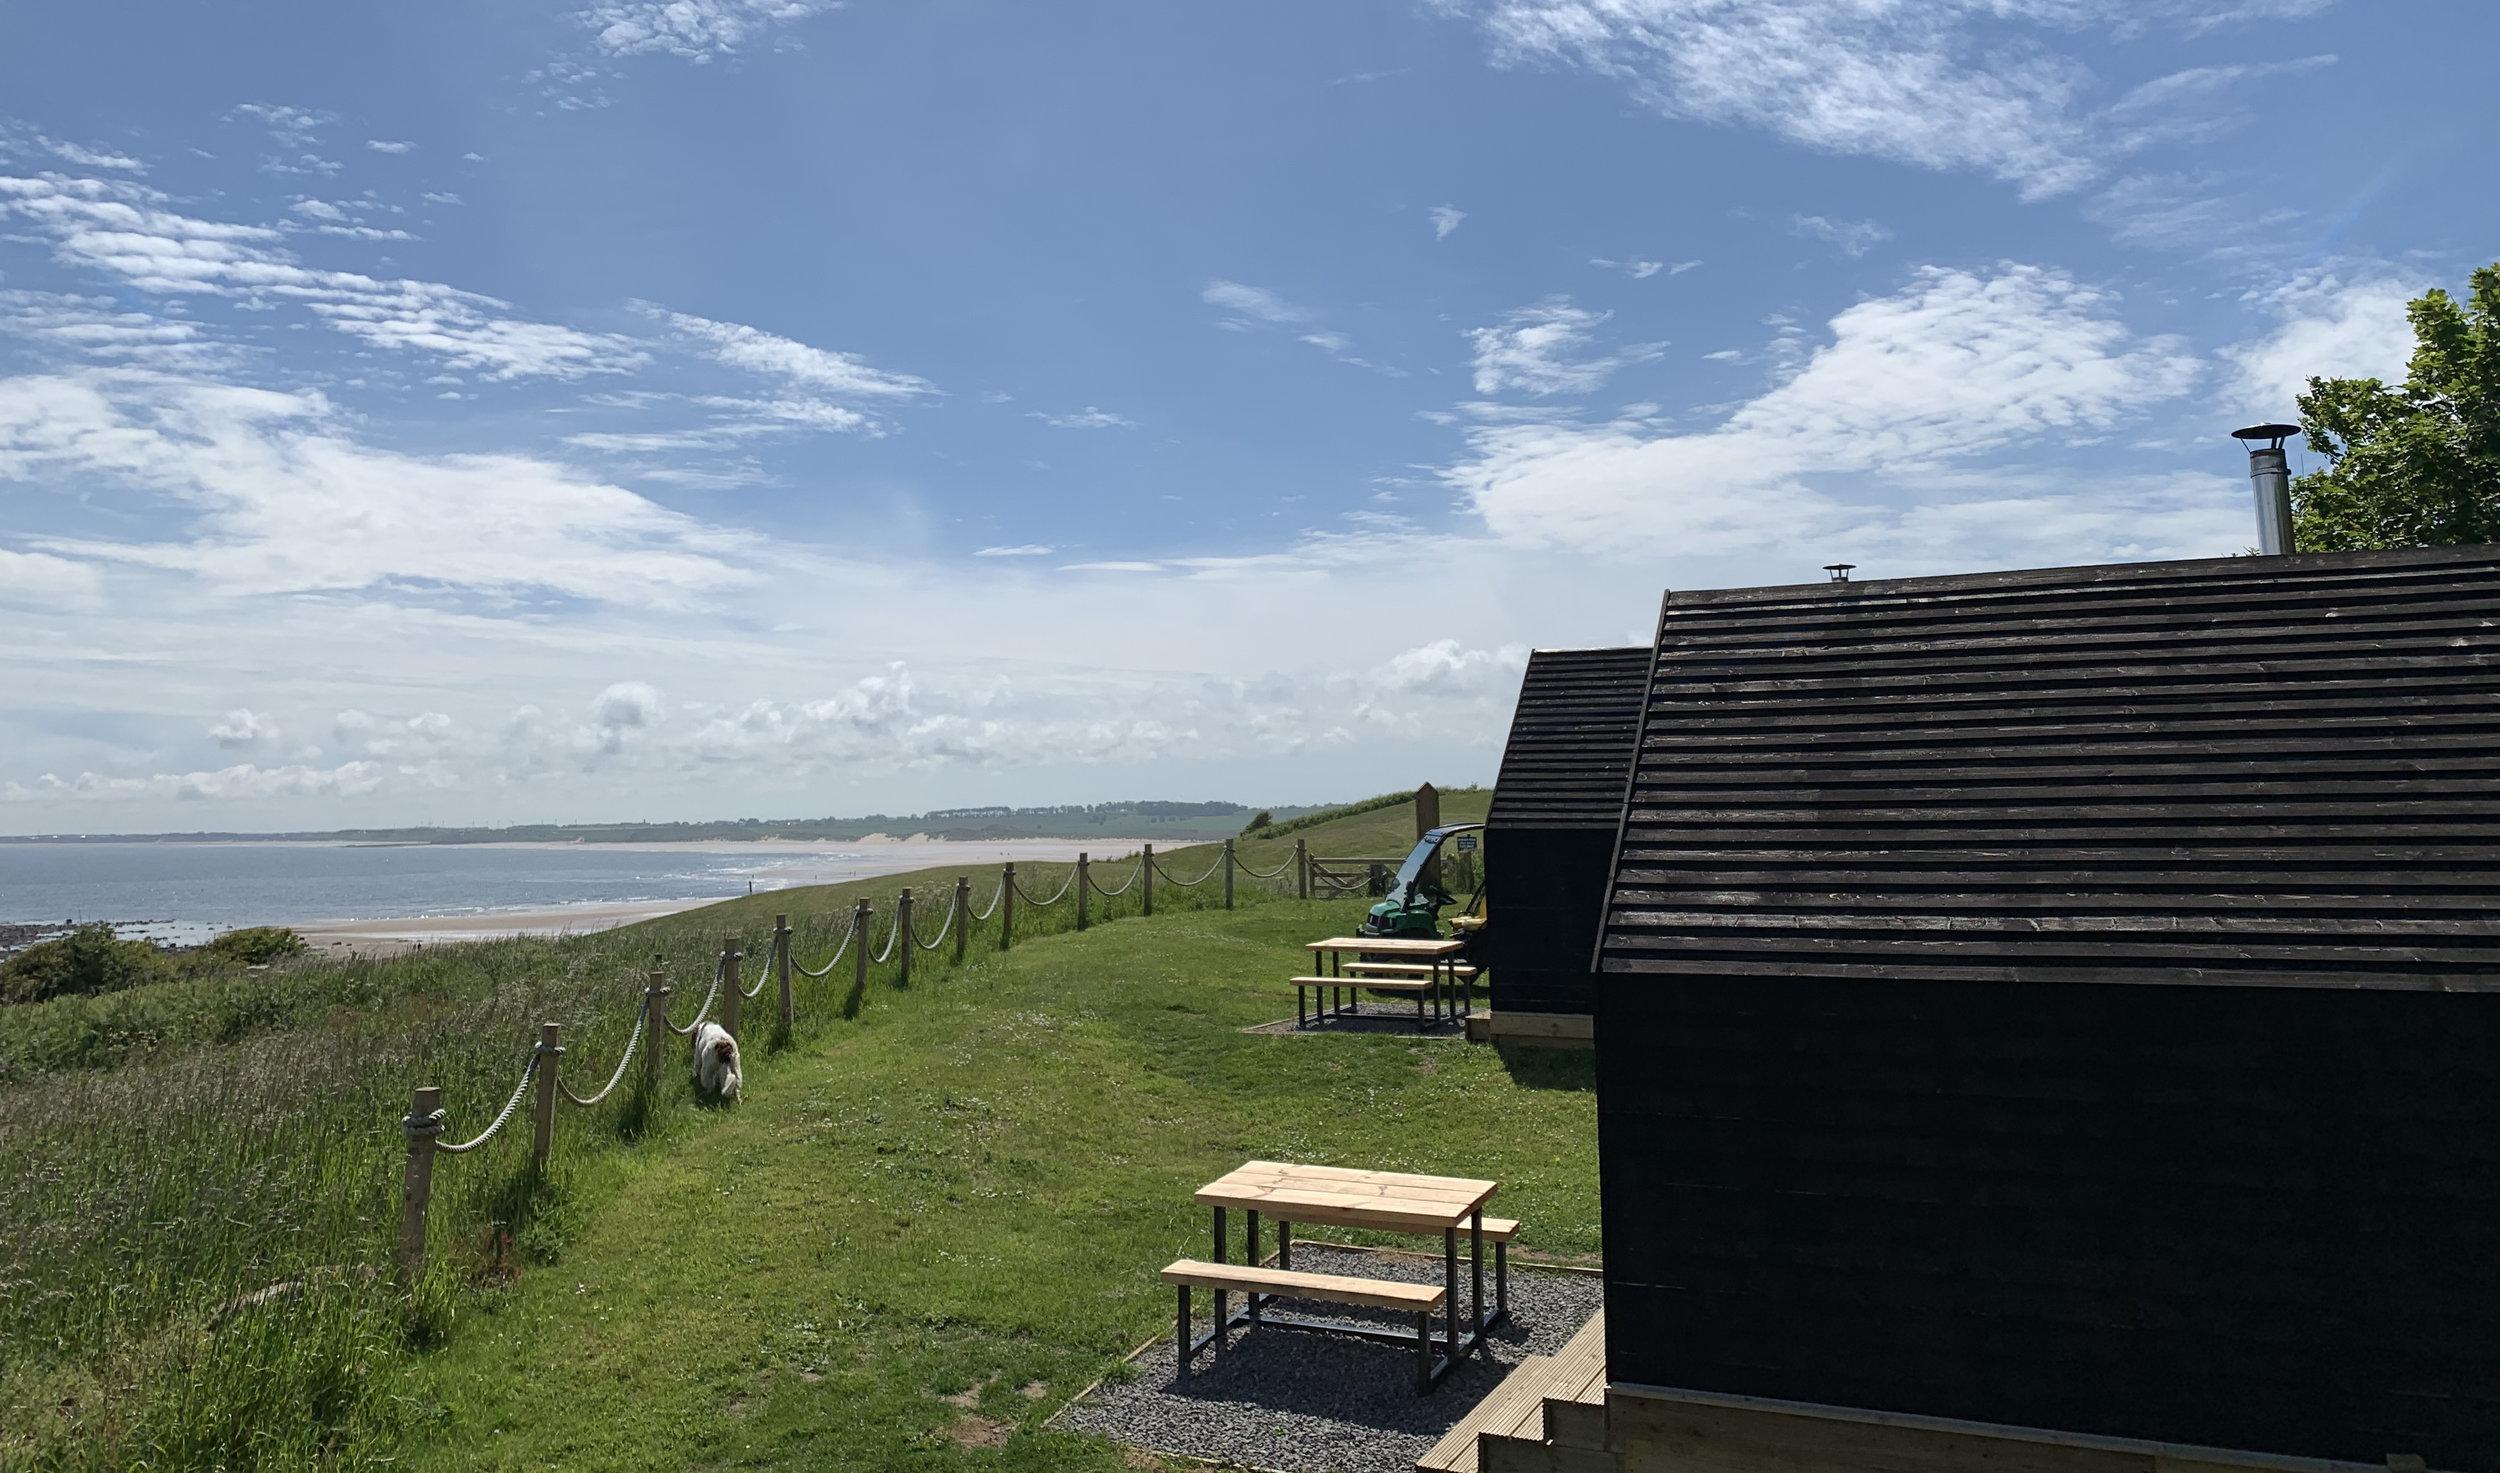 Shoreside huts seaview.jpg